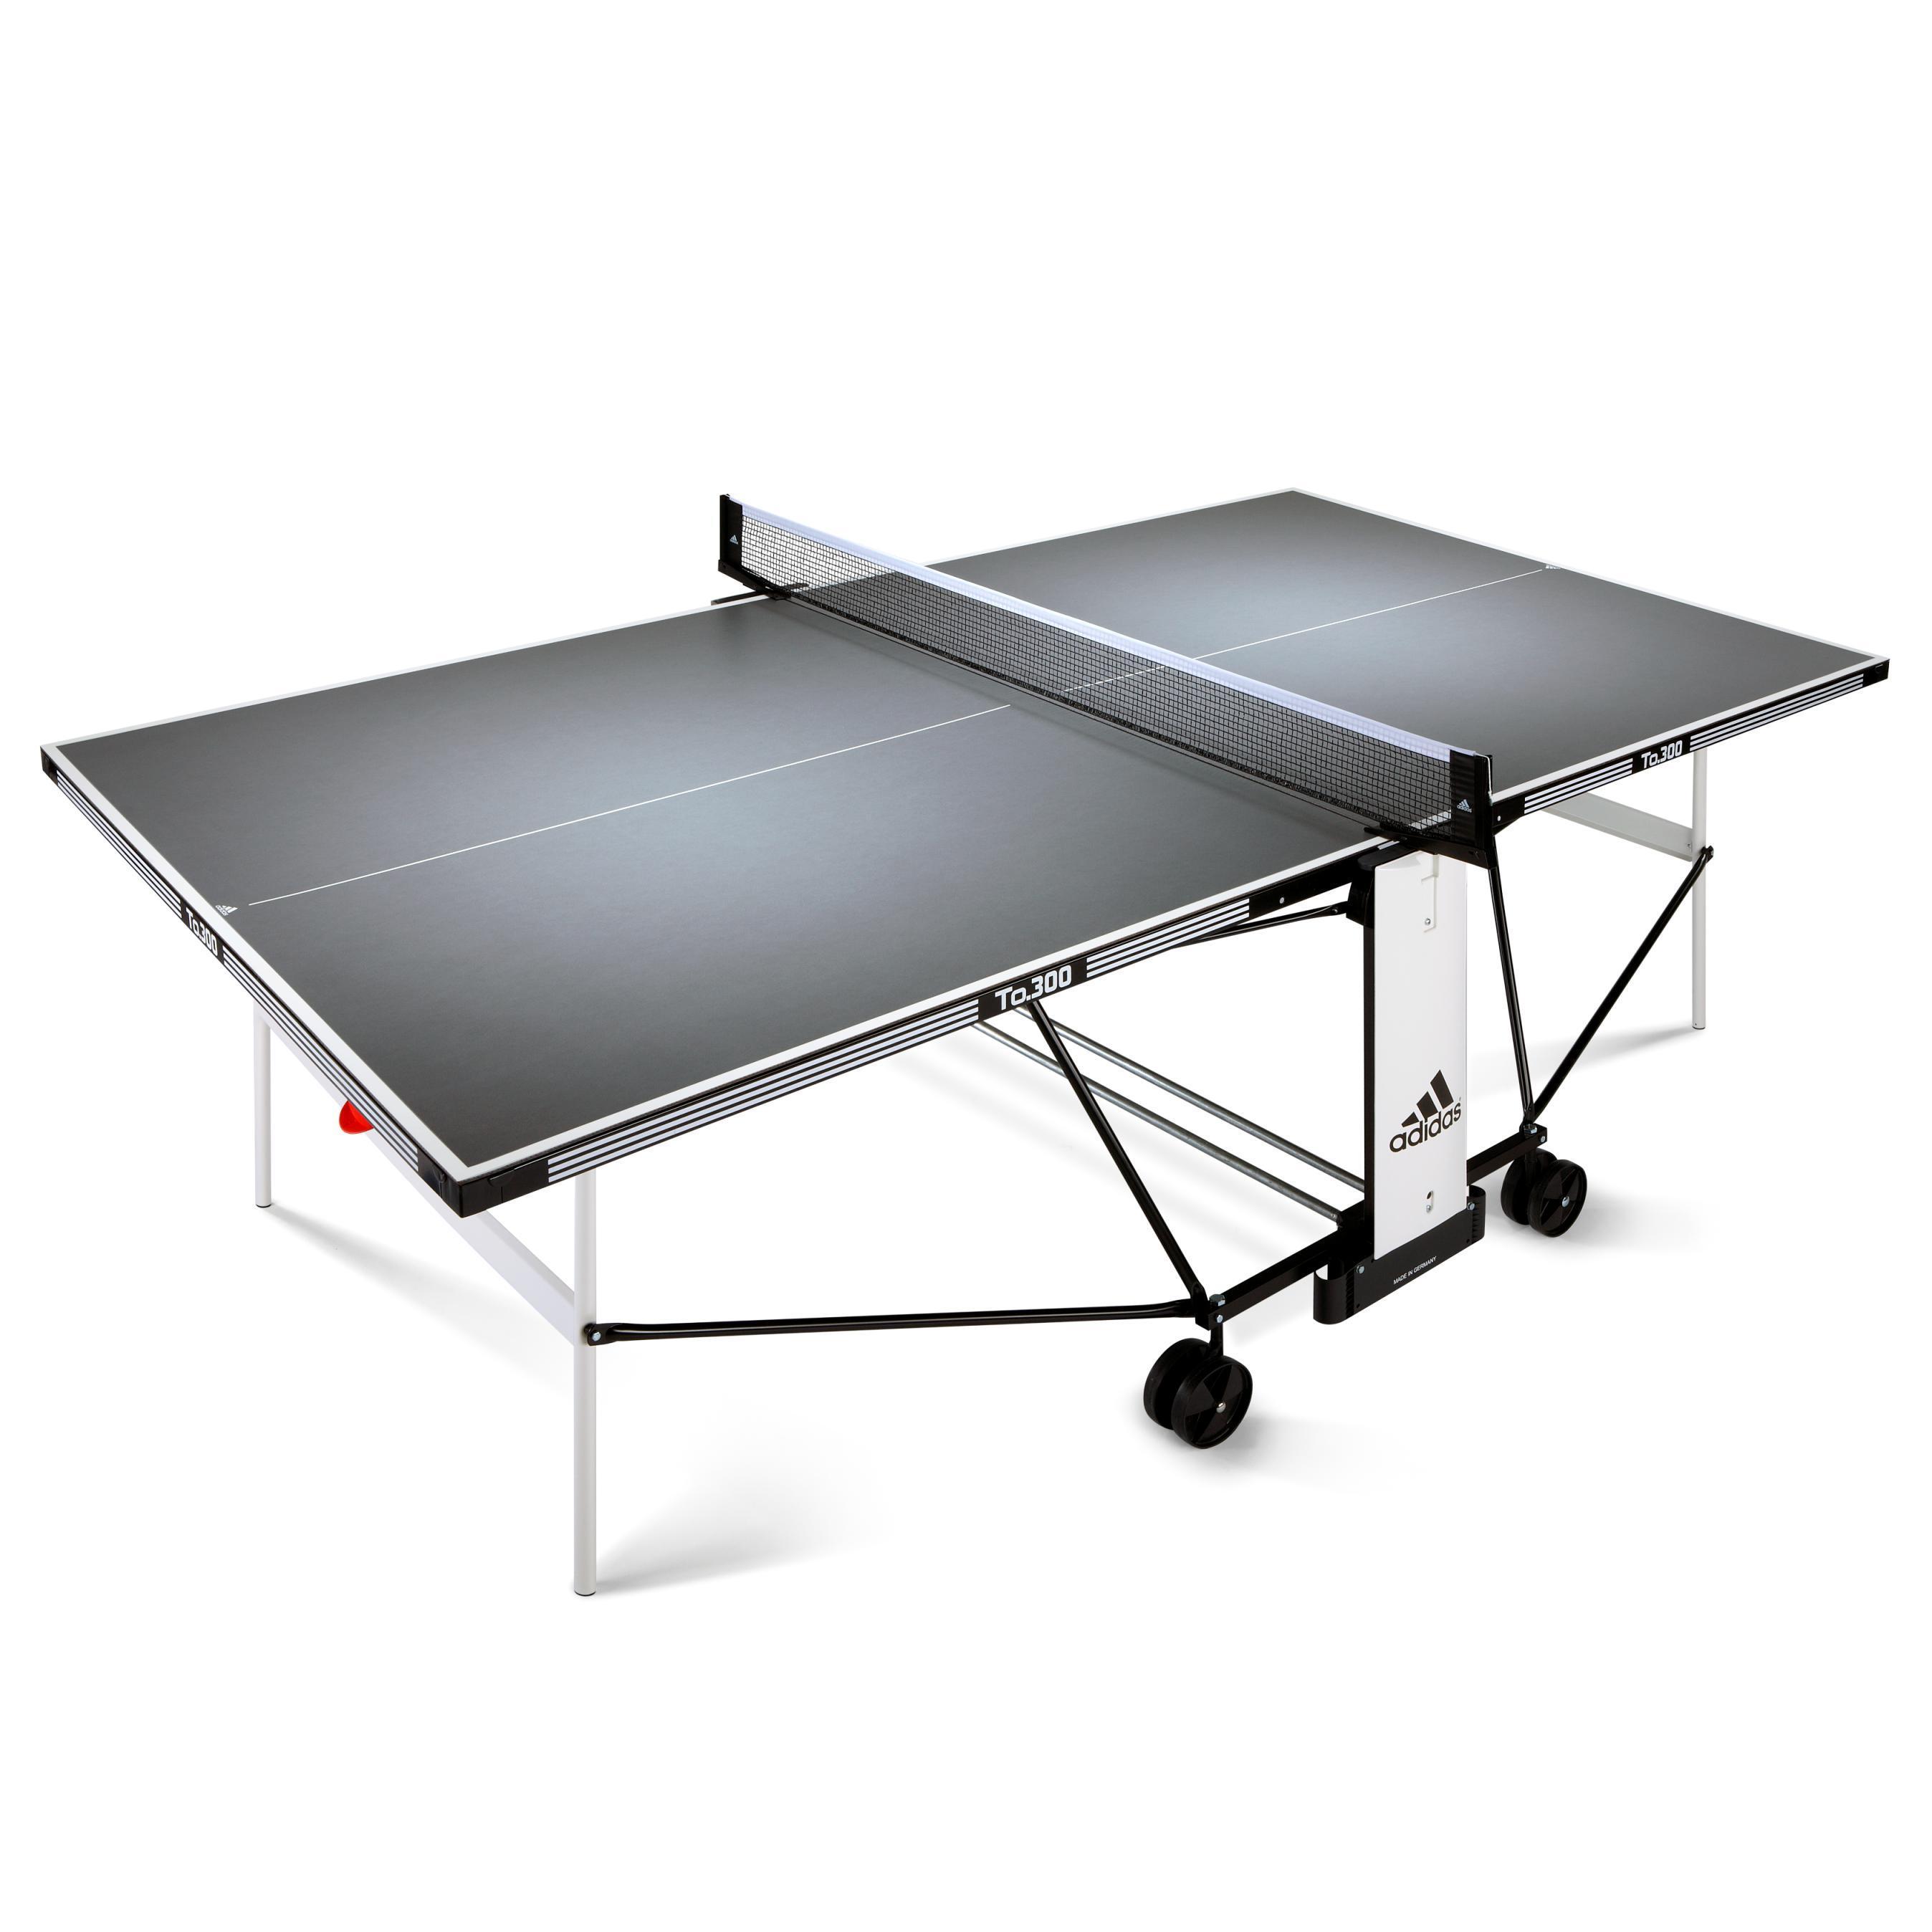 Adidas outdoor table tennis table grey - Weatherproof table tennis table ...